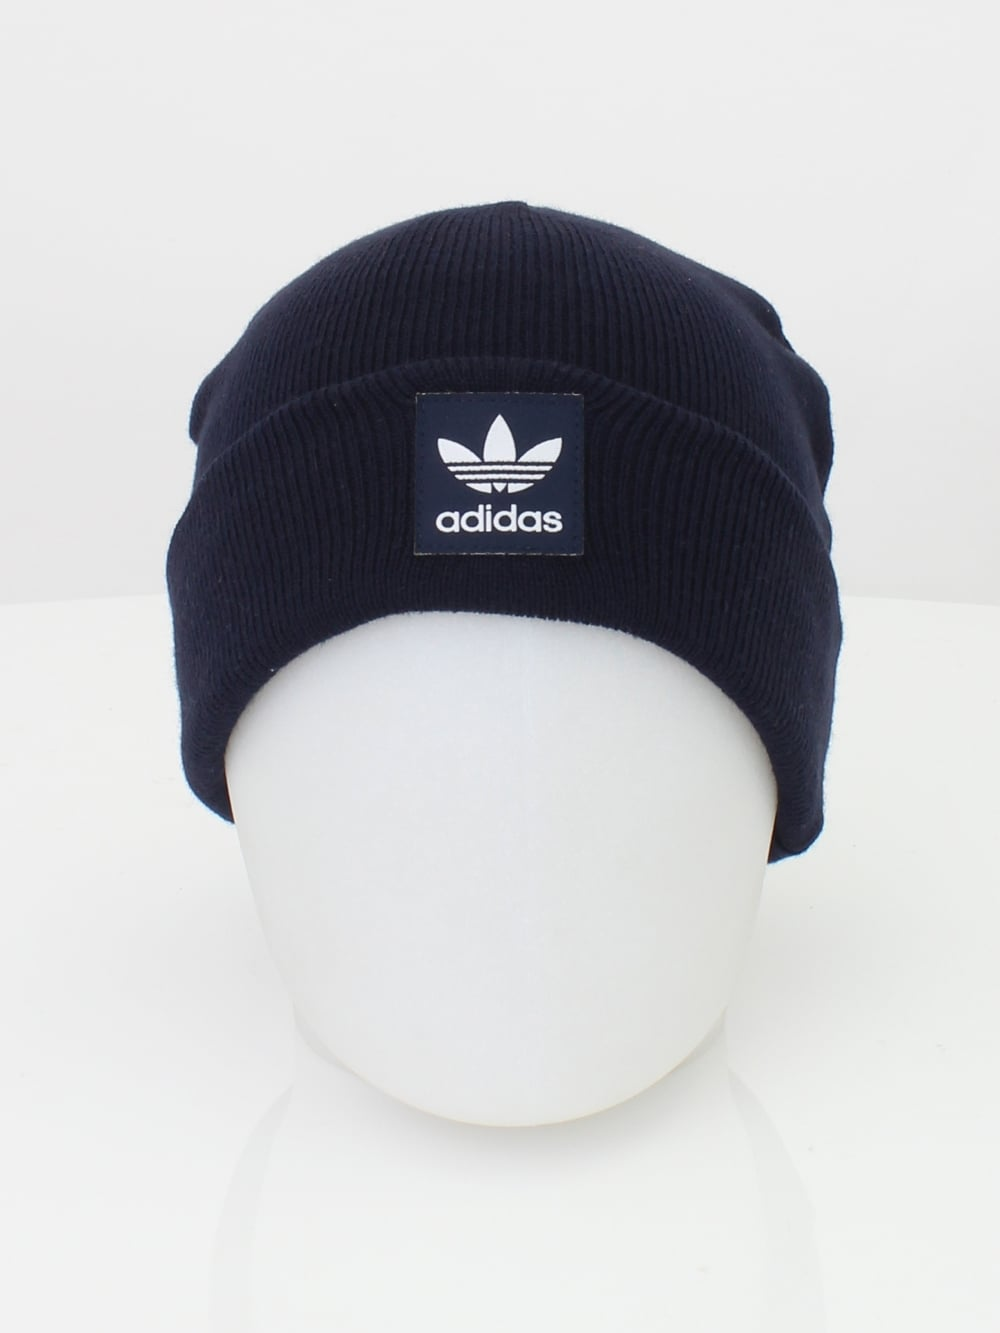 e7d3f62d6c5 Adidas Logo Beanie in Legend Ink - Northern Threads